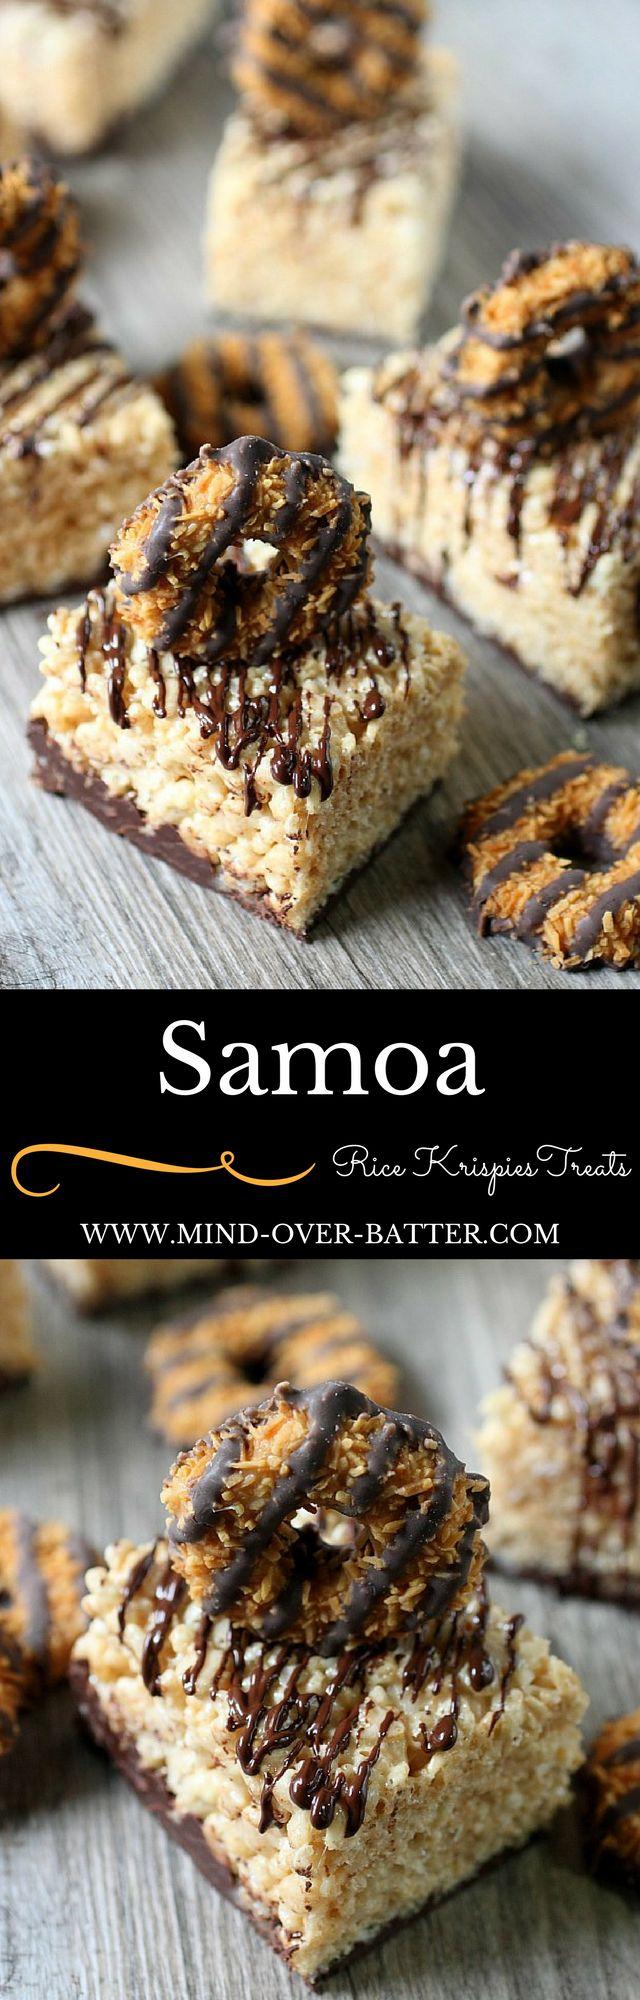 Samoa Rice Krispies Treats - www.mind-over-batter.com